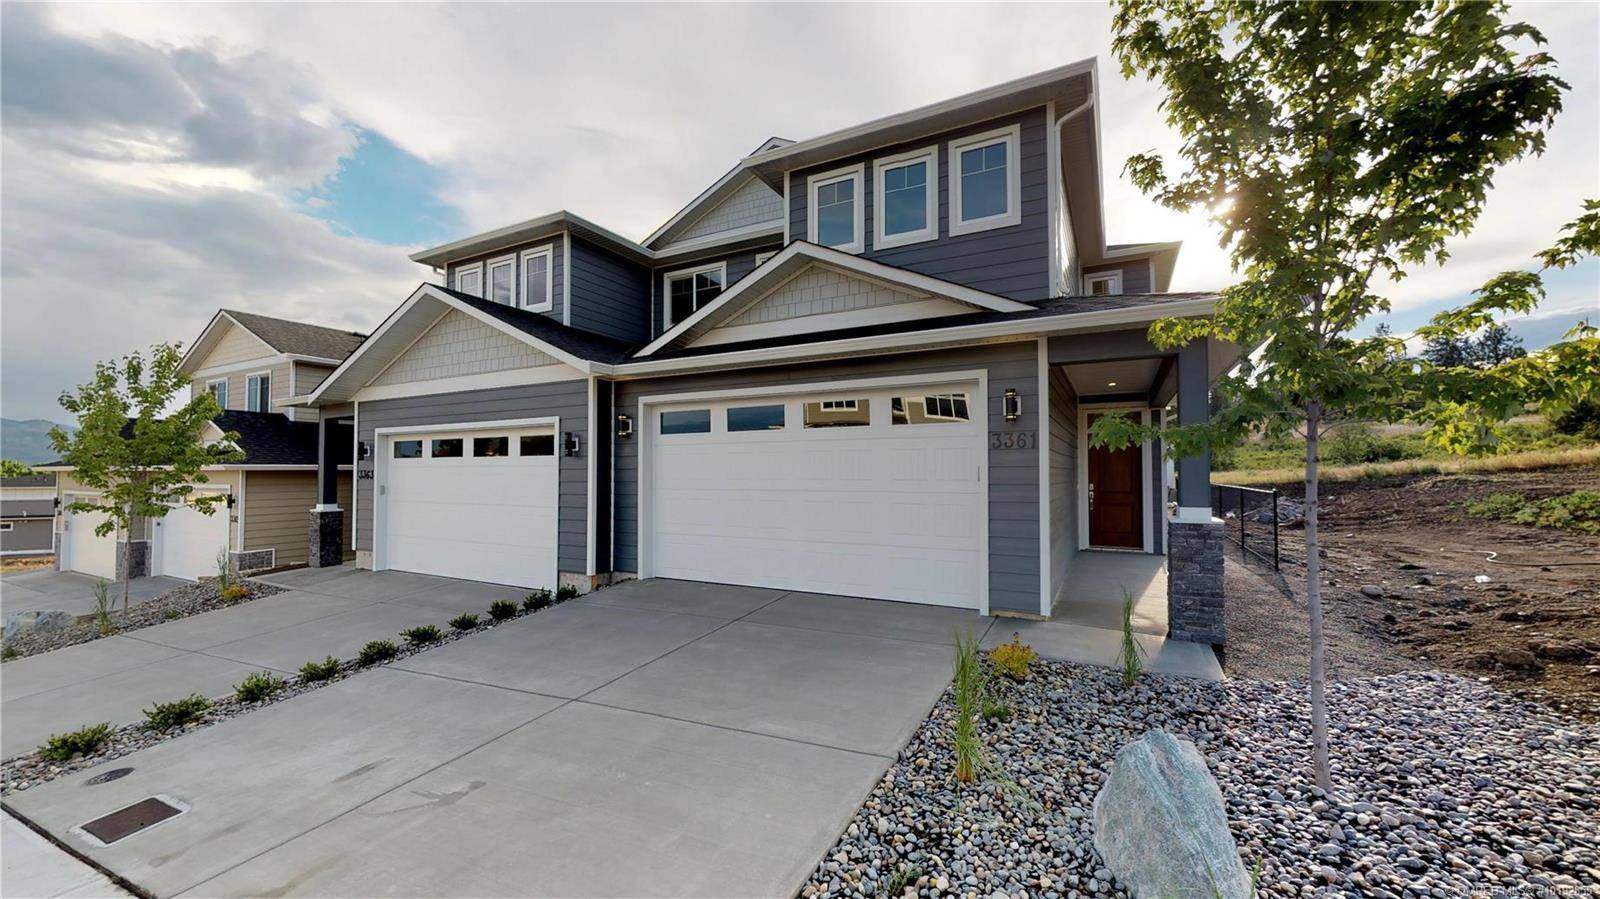 House for sale at 3369 Hawks Cres West Kelowna British Columbia - MLS: 10192855